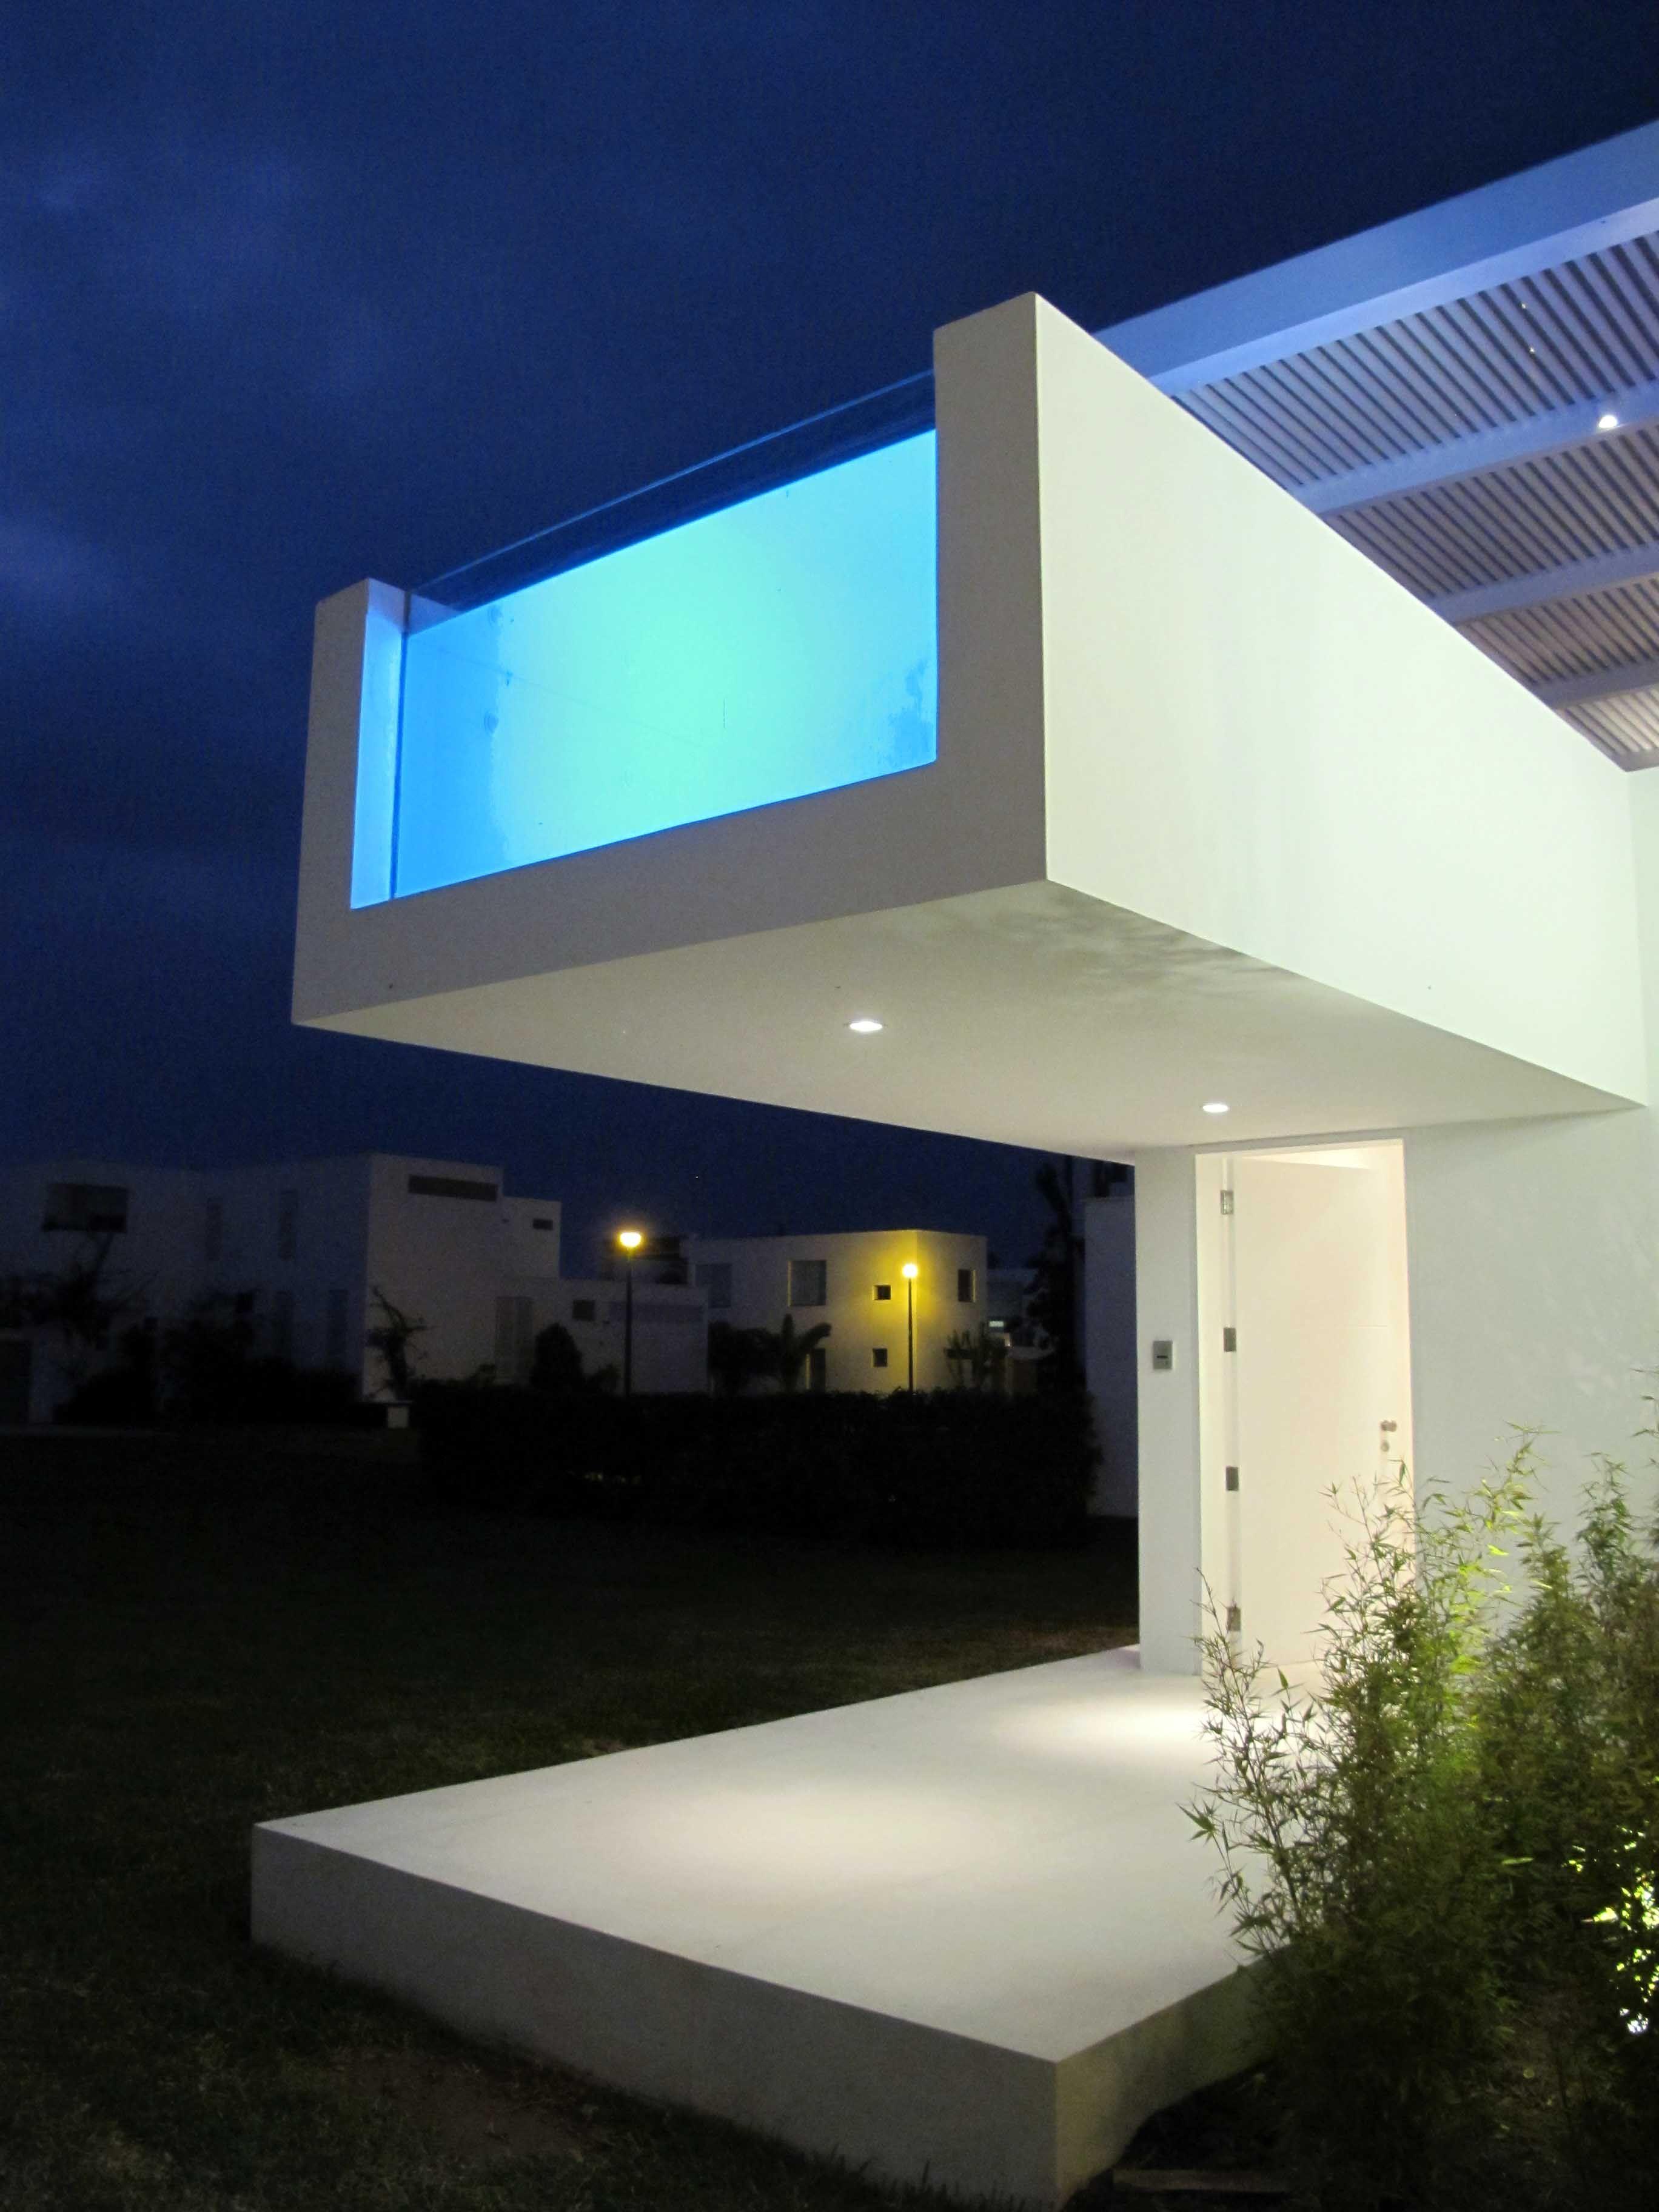 The best architecture exterior architecture pinterest